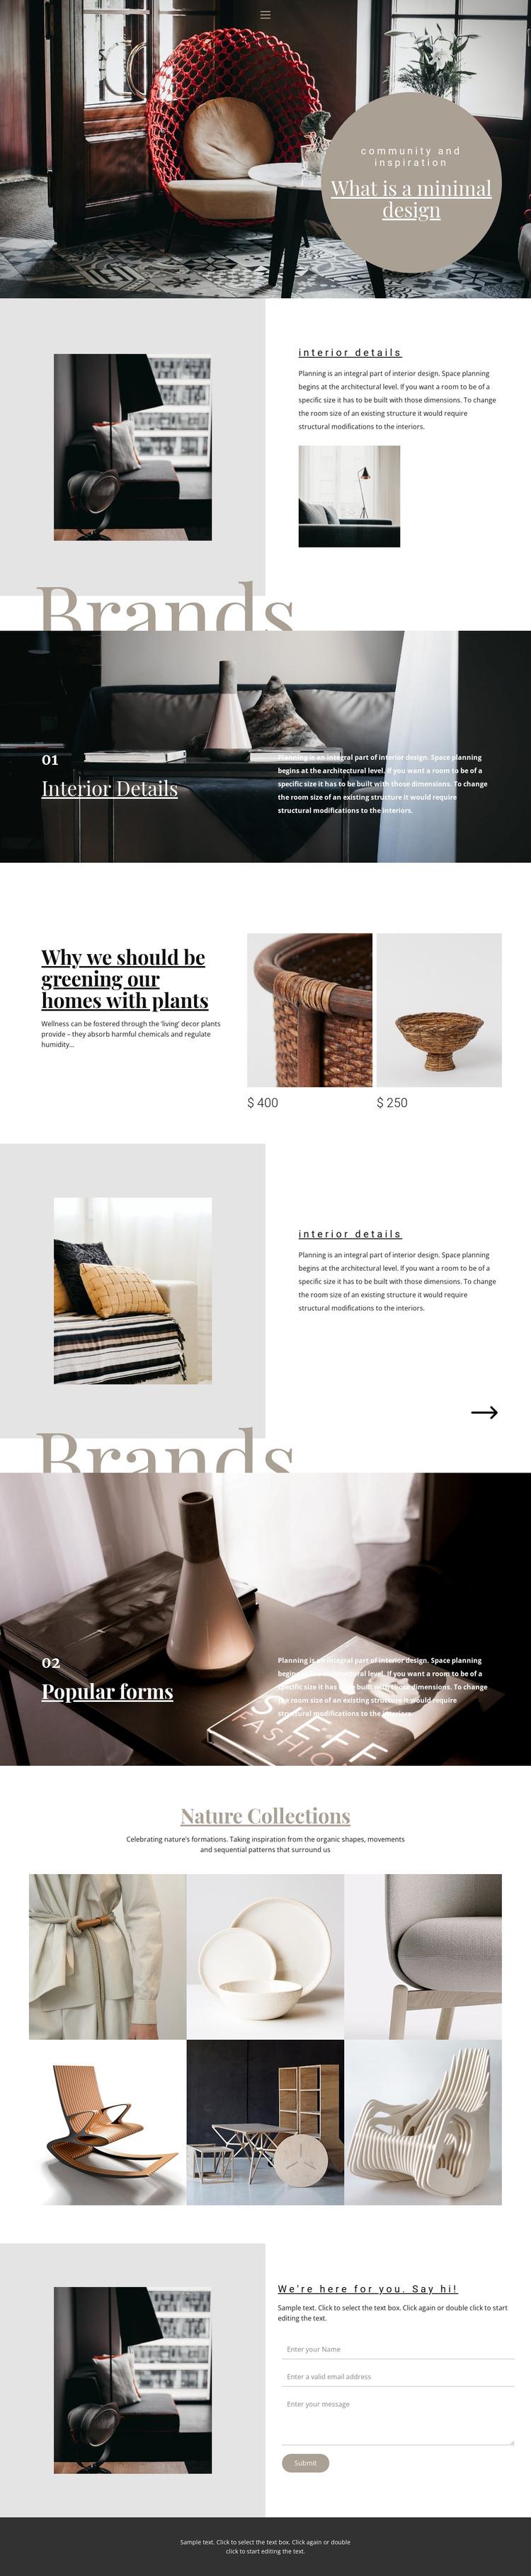 Interior brands Website Builder Software